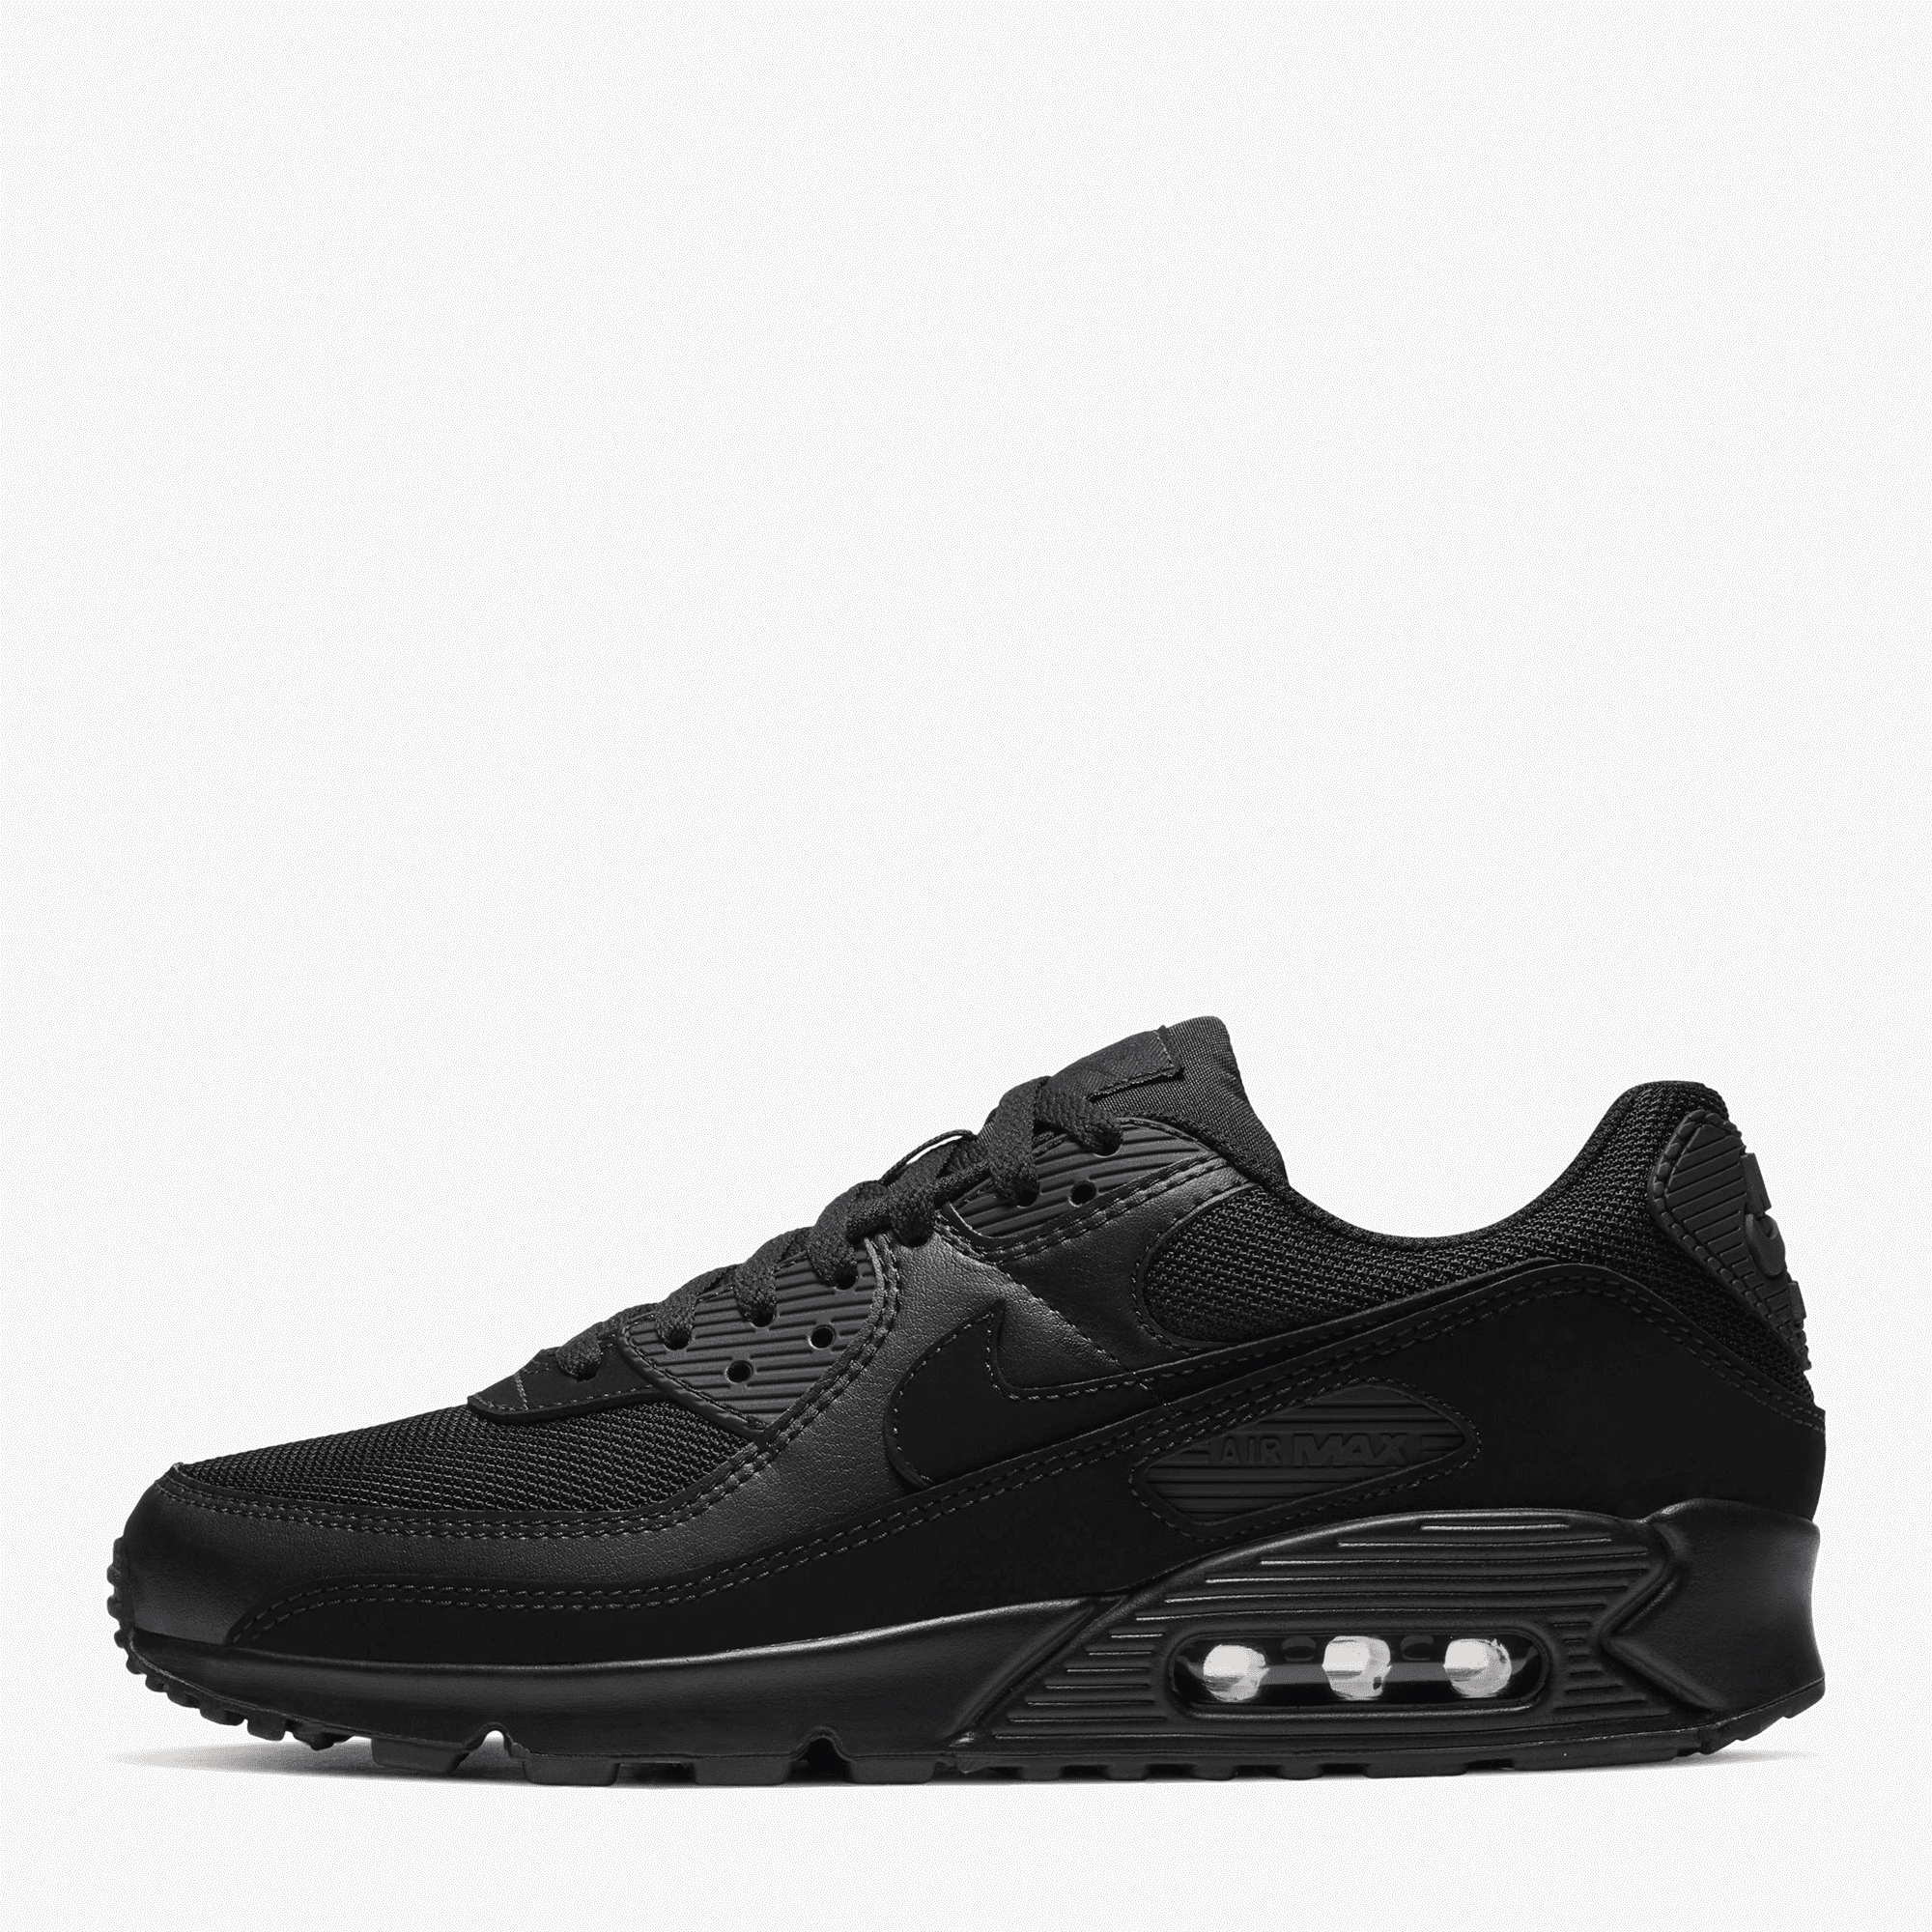 Nike Air Max 90 Triple Black - Mens